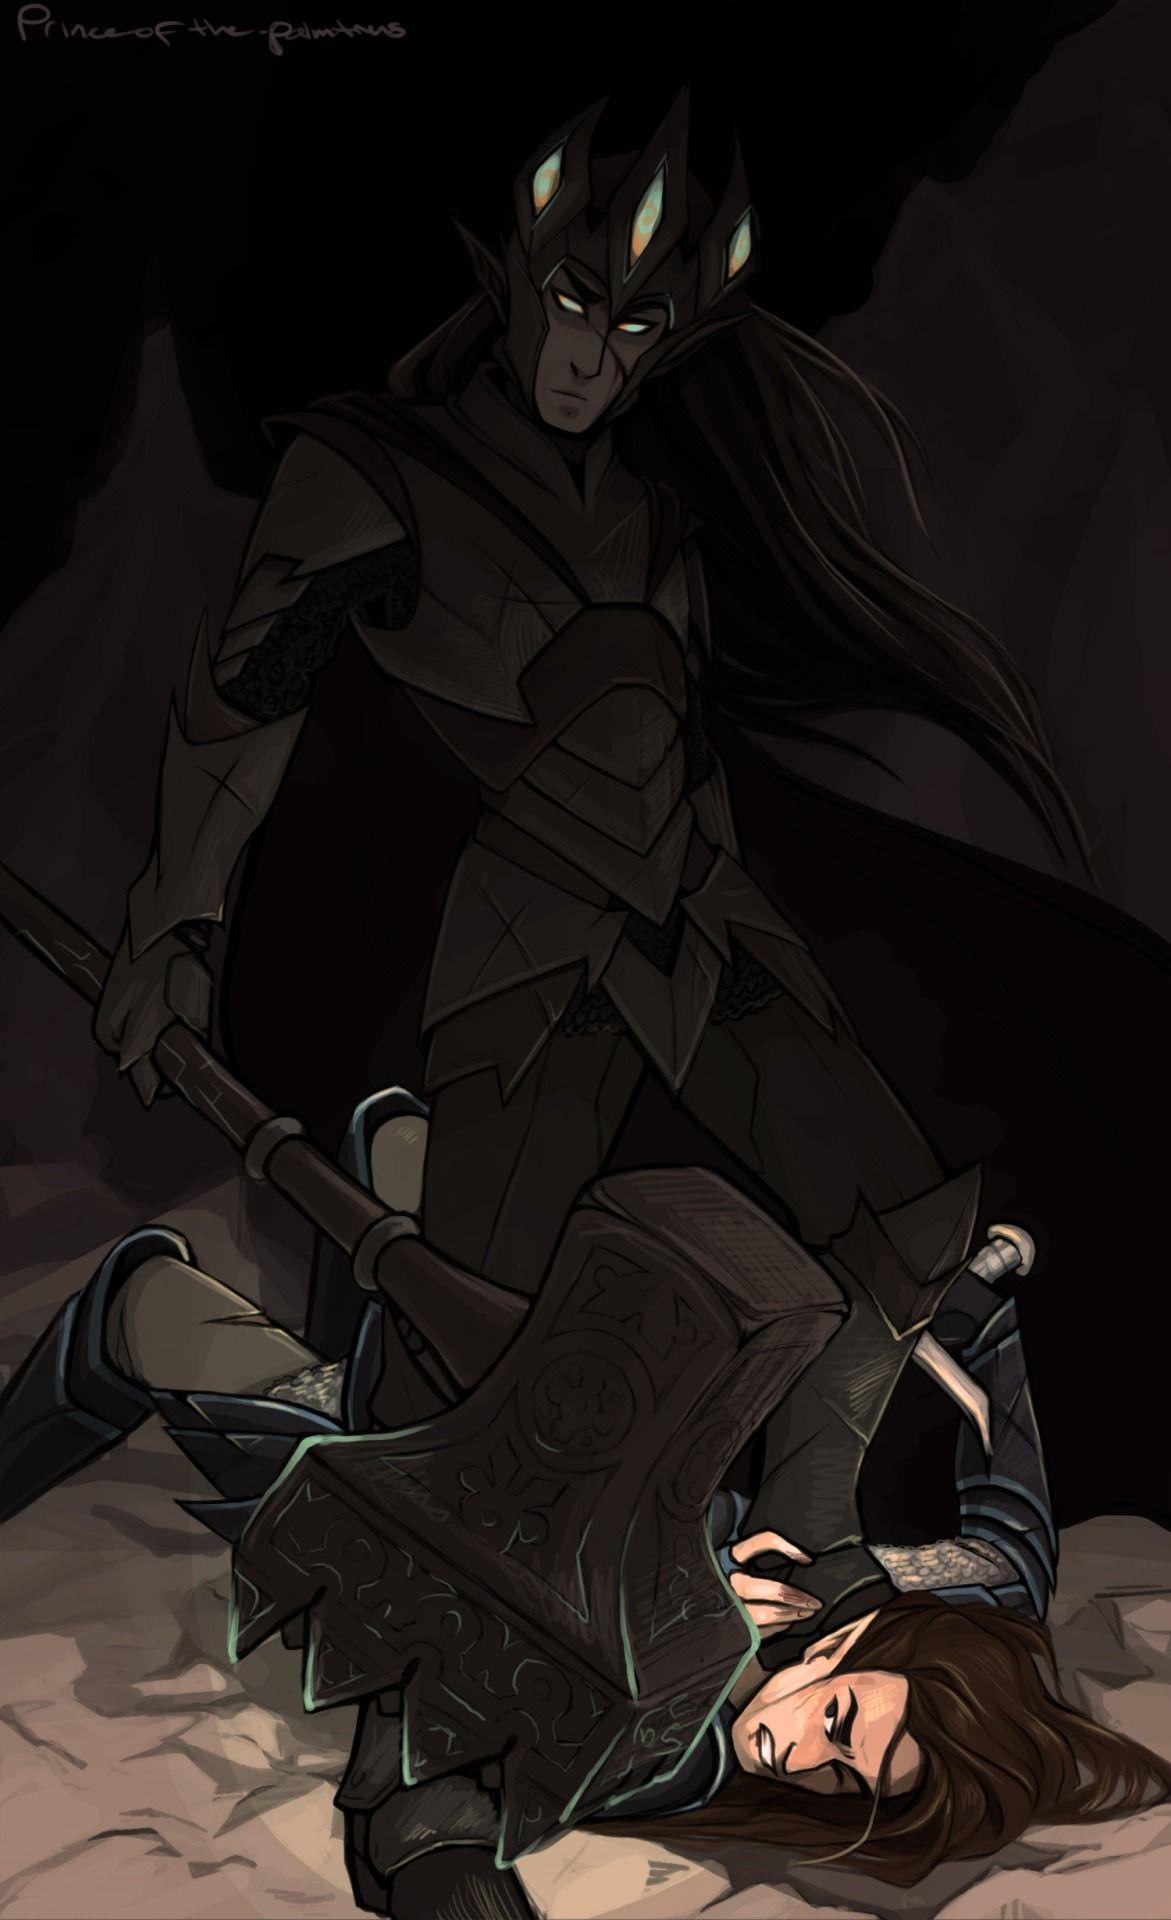 La muerte de Fingolfin